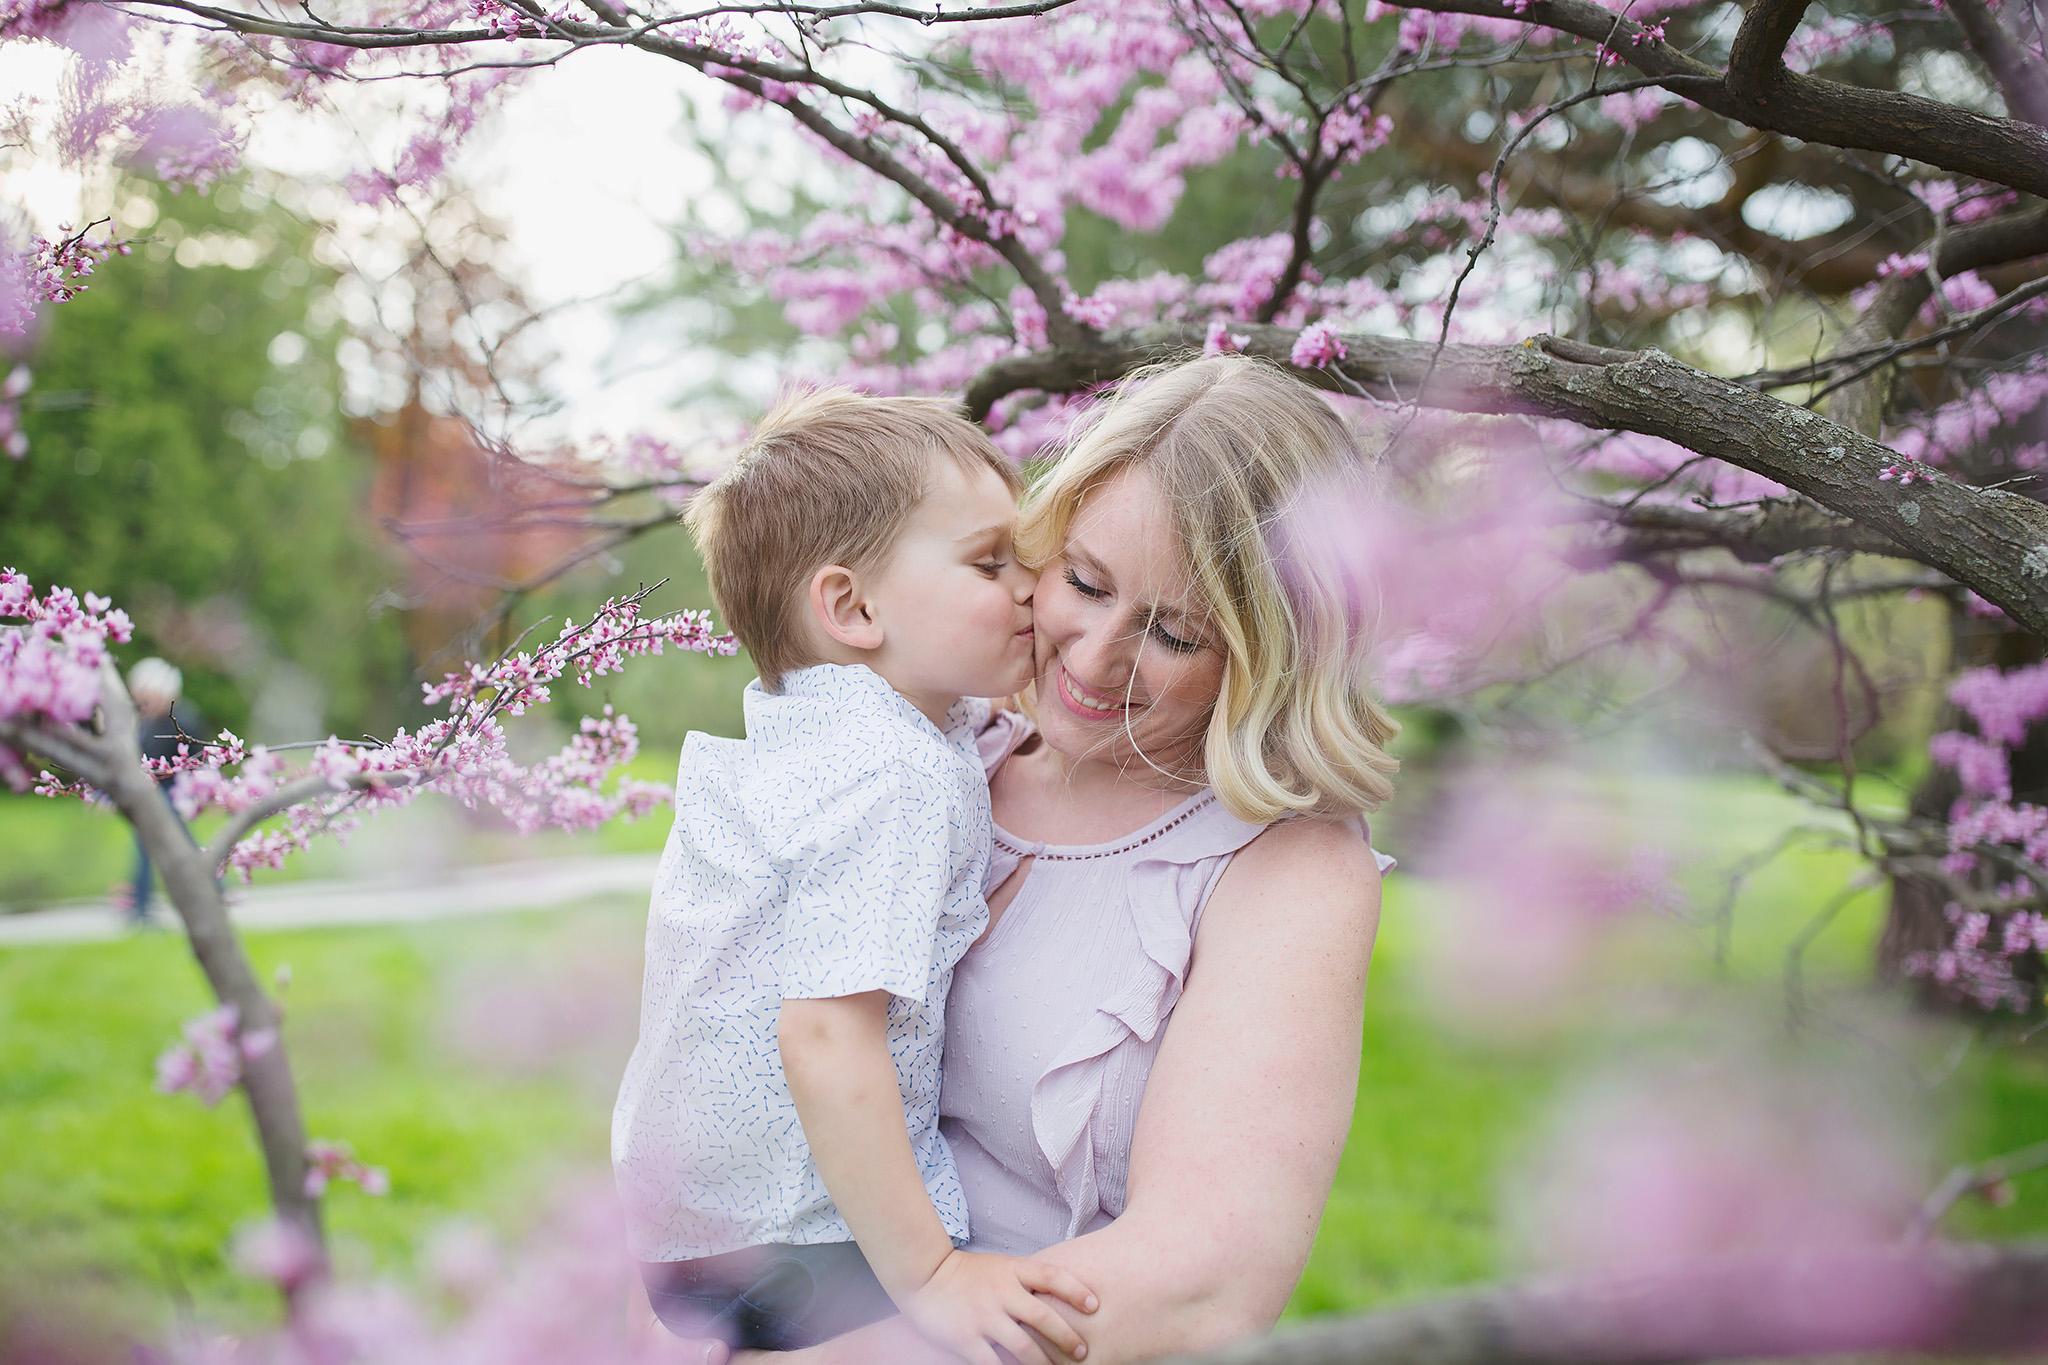 london_ontario_family_photographer-raw_footage_photography-spring_blossom_mini_sessions-magnolia-springbank_park027.jpg